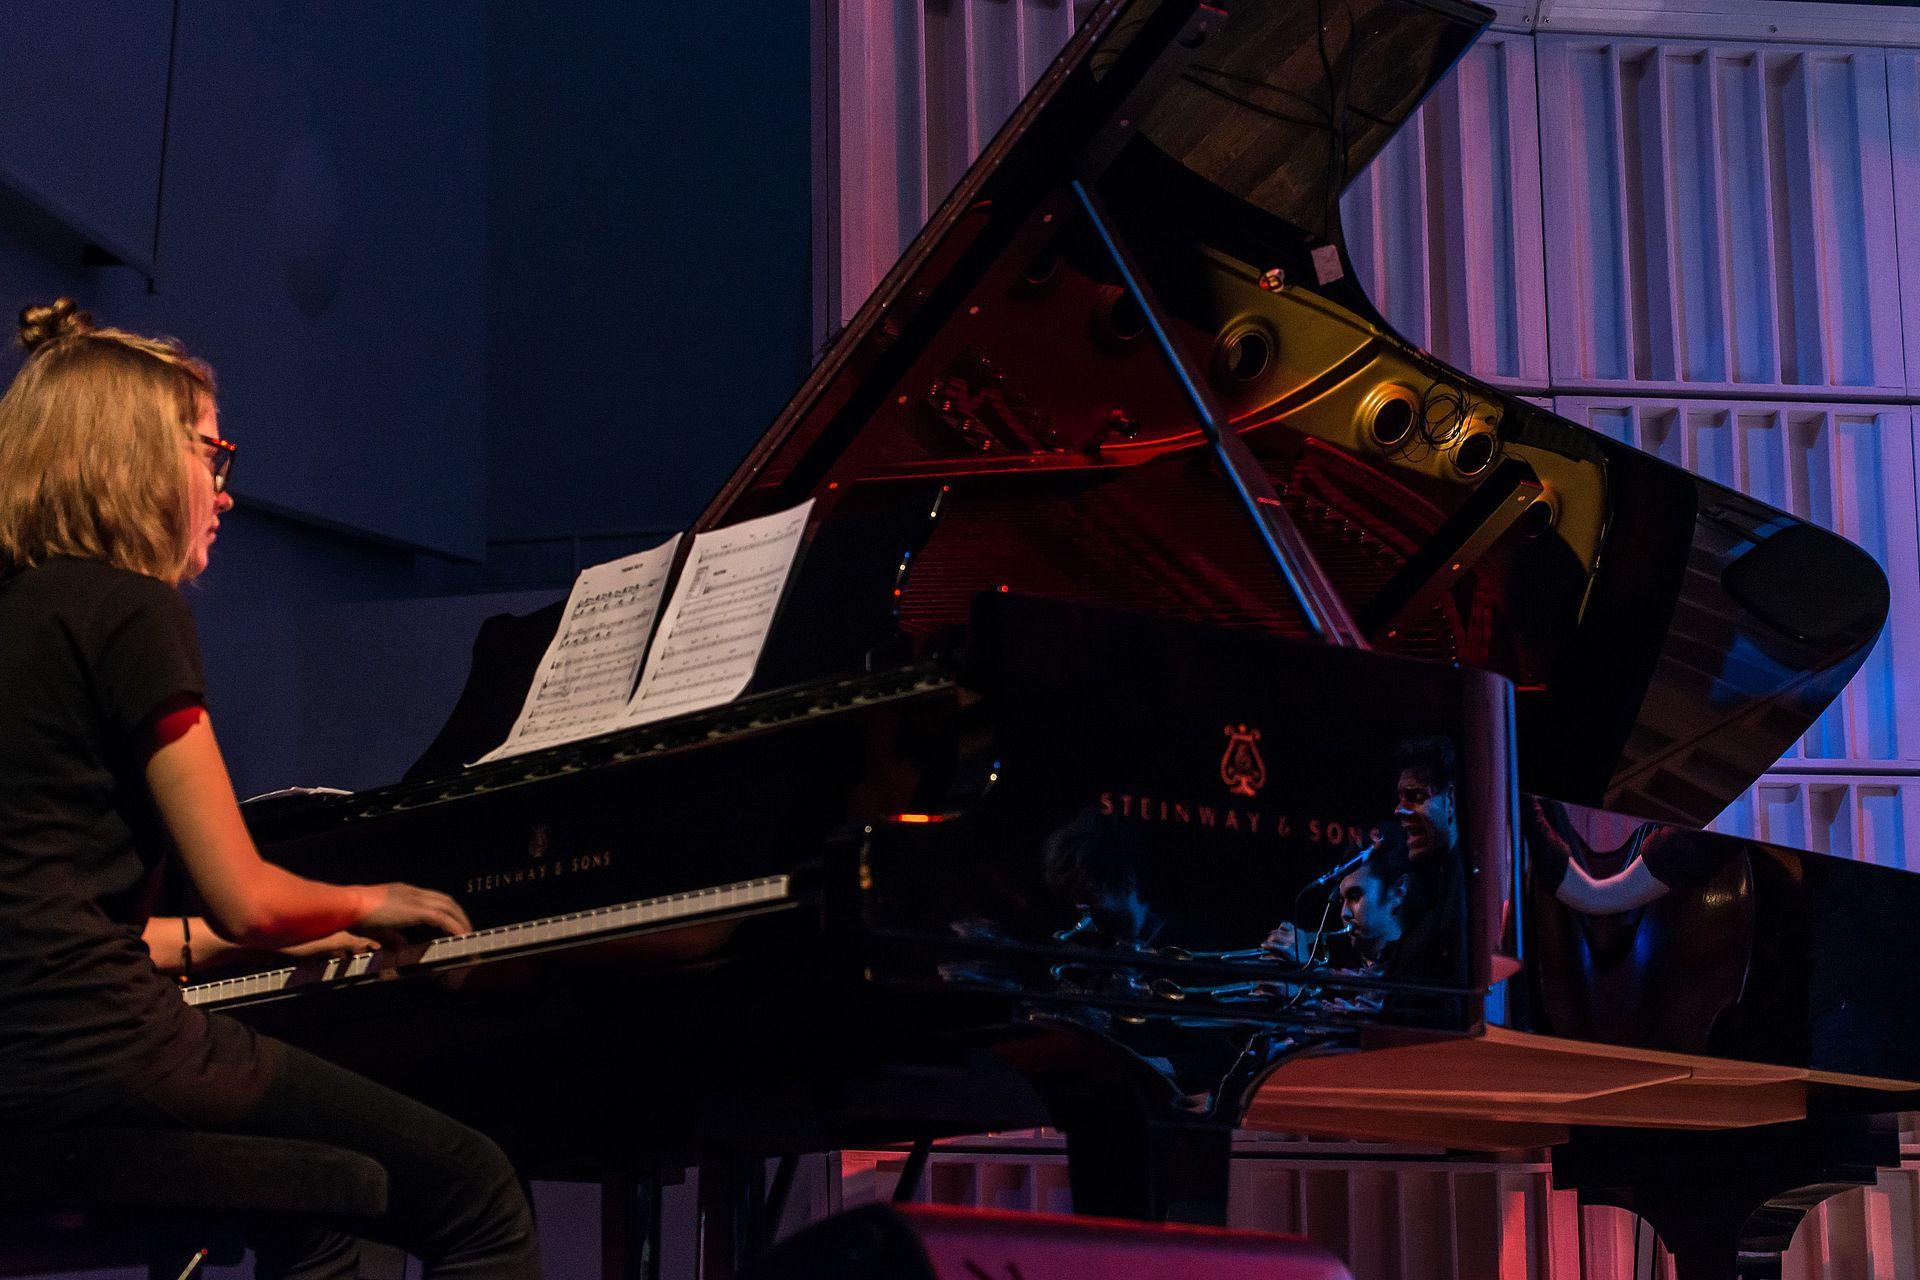 Pianistin/Foto: Marcus Lieder